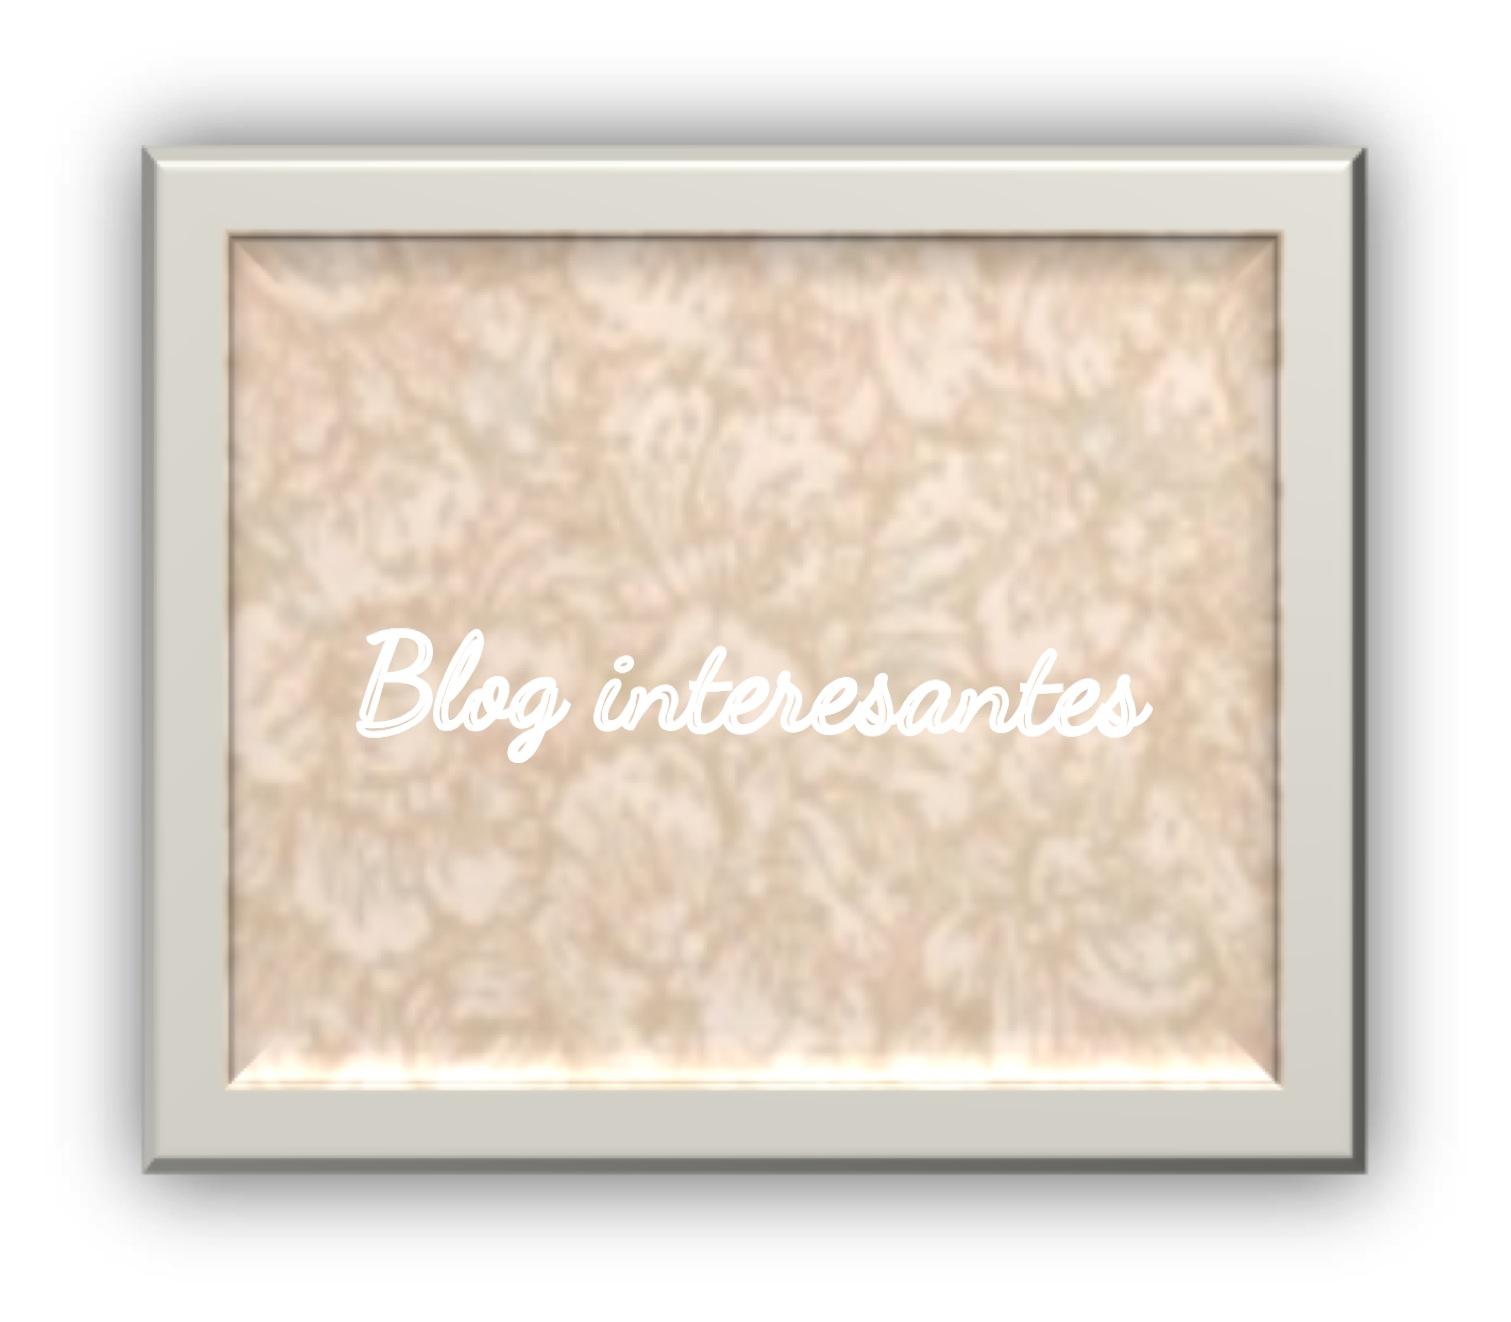 Mis blog favoritos